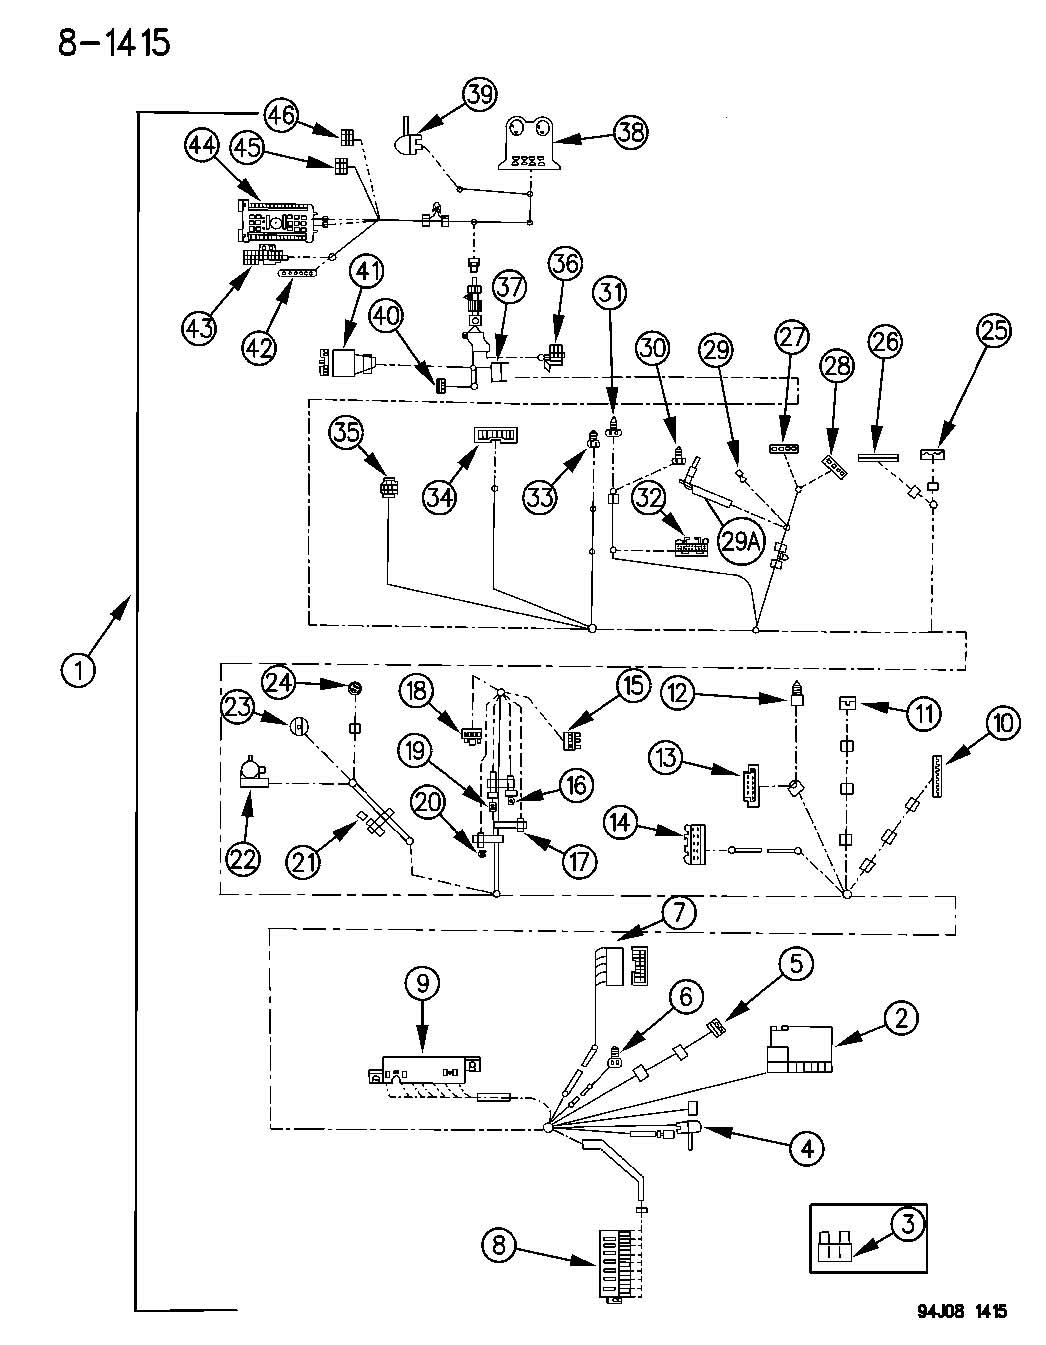 1993 Jeep Wrangler Fuse Box Diagram View Diagram Jeep Wrangler Hello I